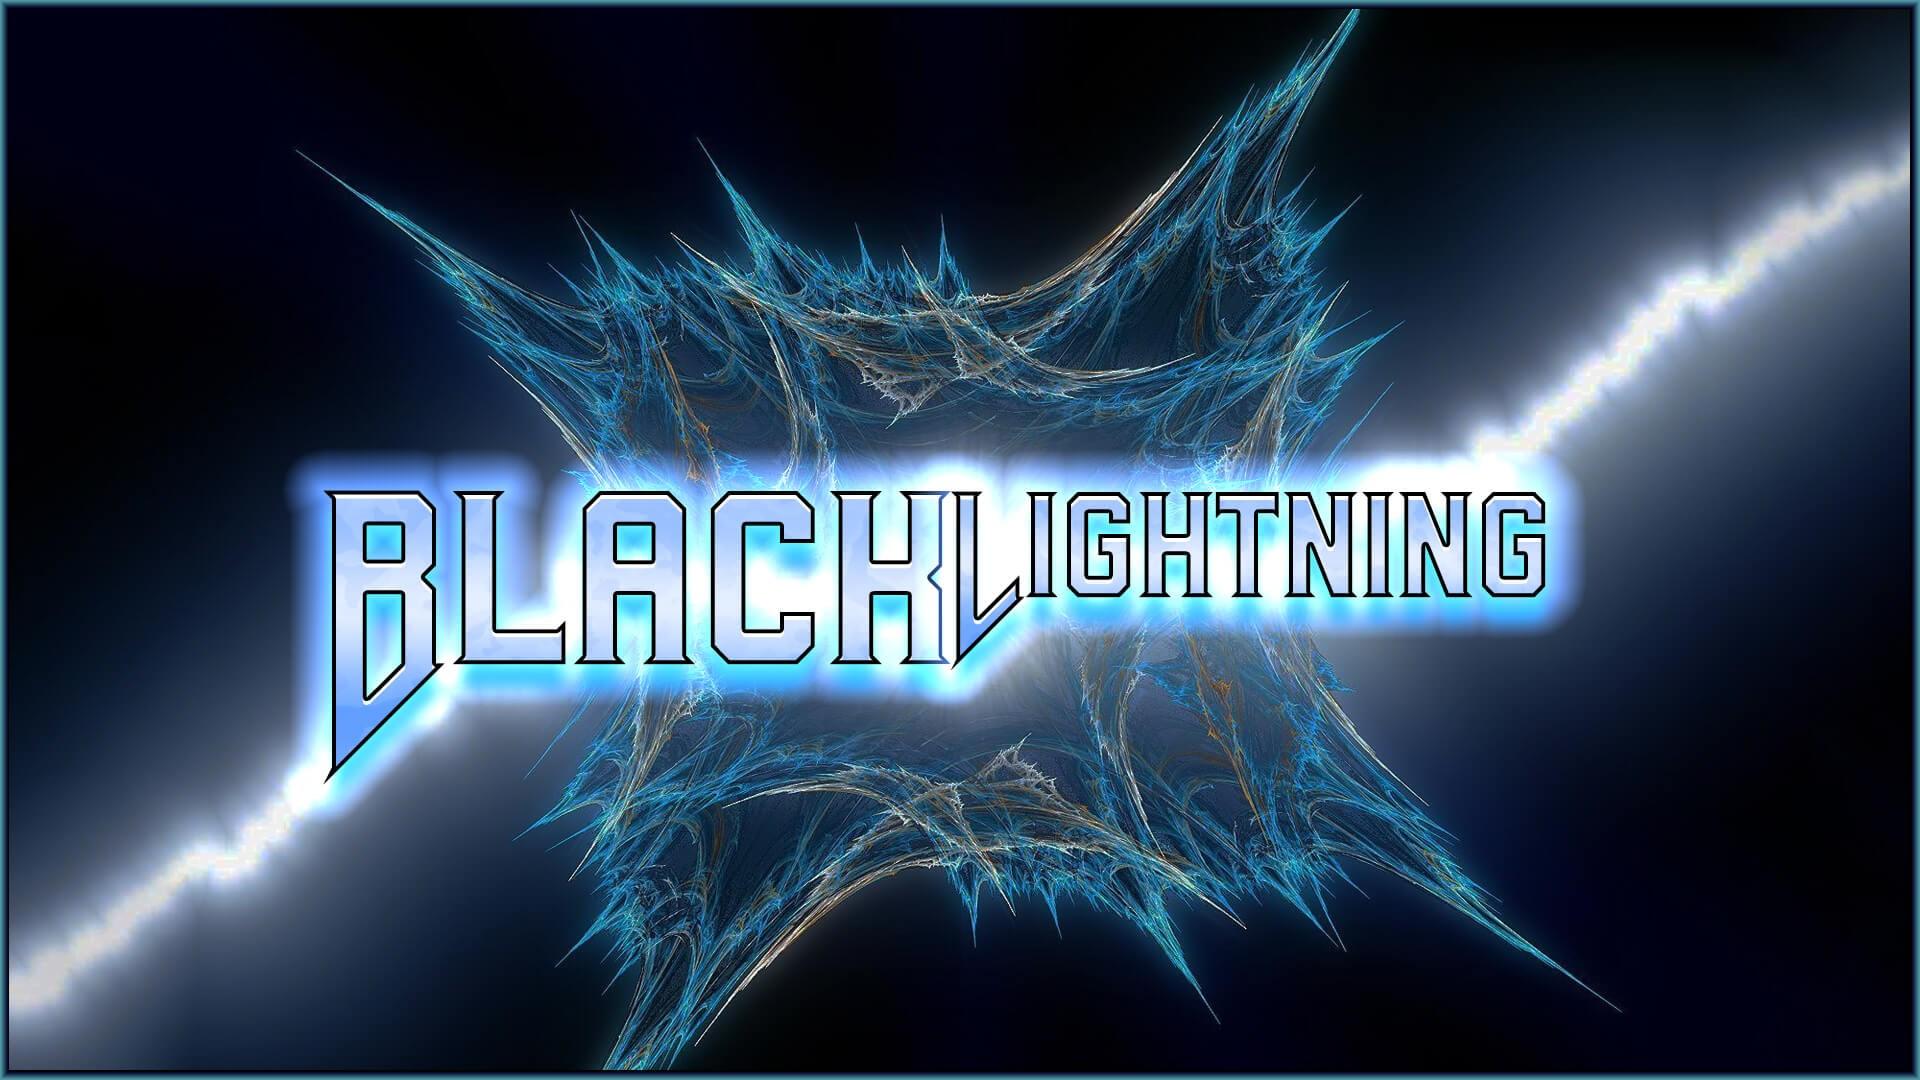 How to install Black Lightning for Kodi 17 Krypton or 18 Leia